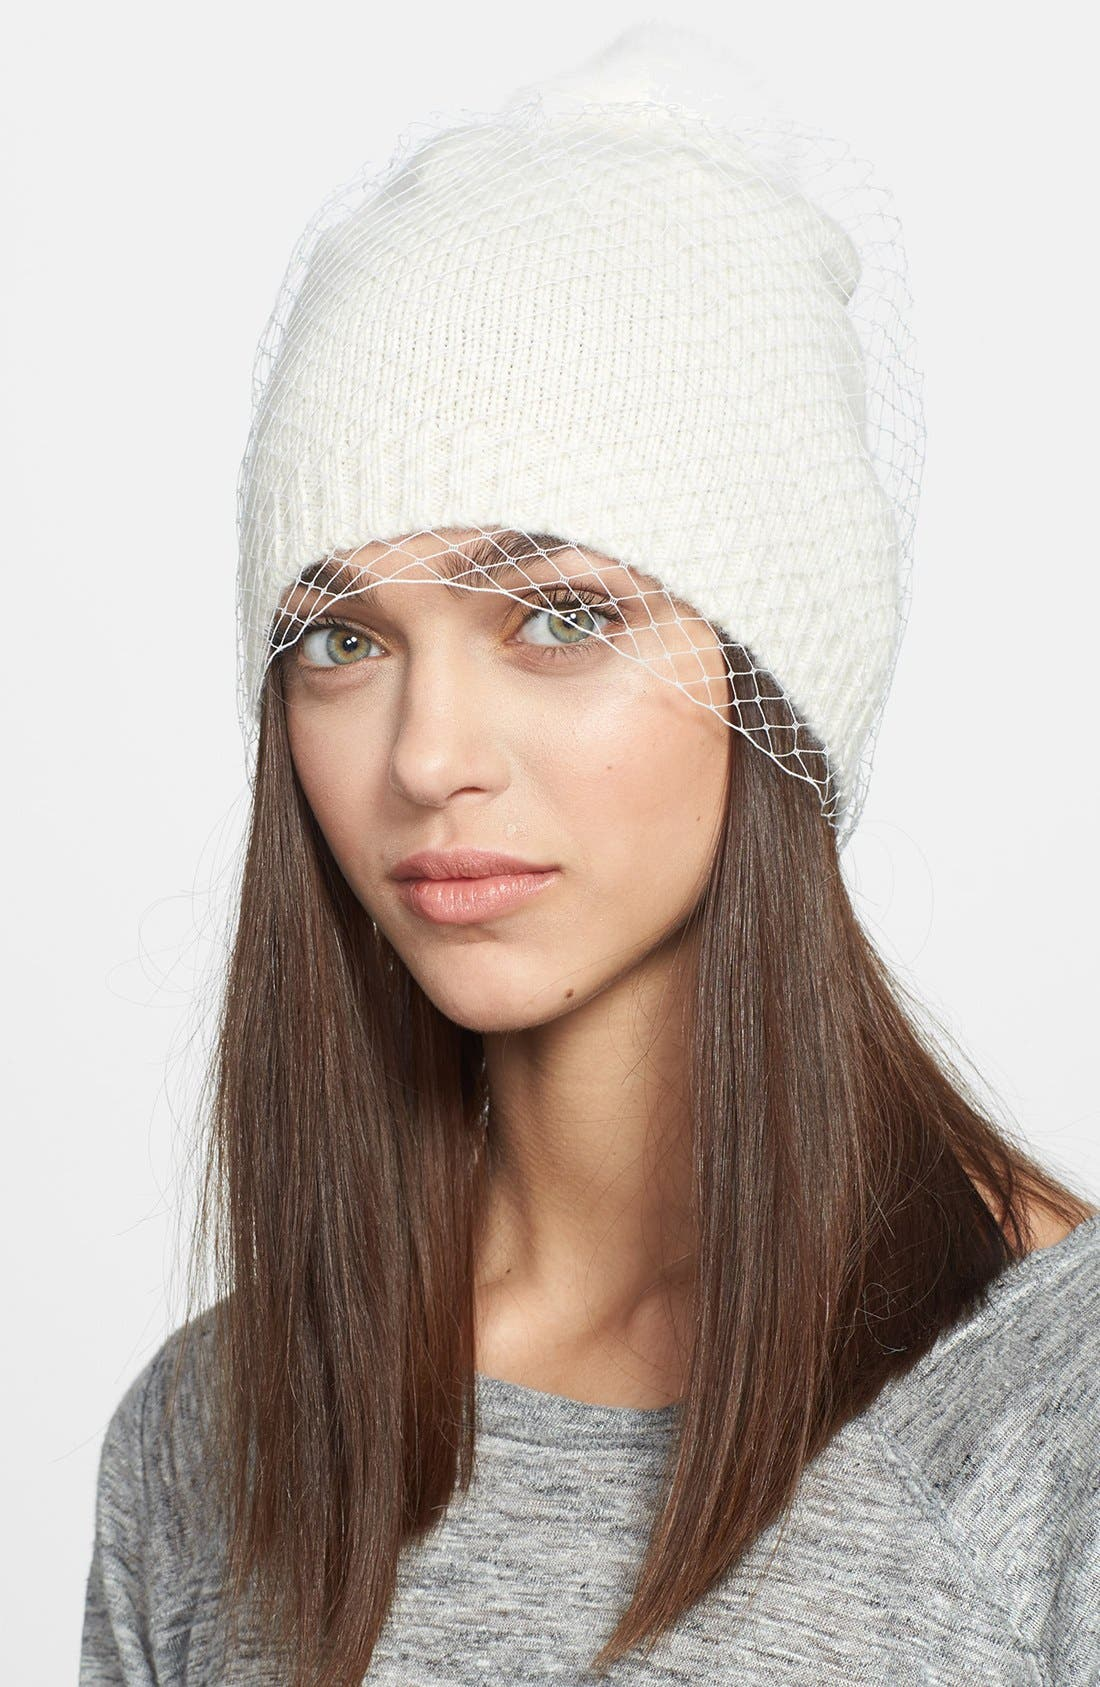 Main Image - BCBGMAXAZRIA 'Winter Veil' Beanie with Genuine Fur Pompom